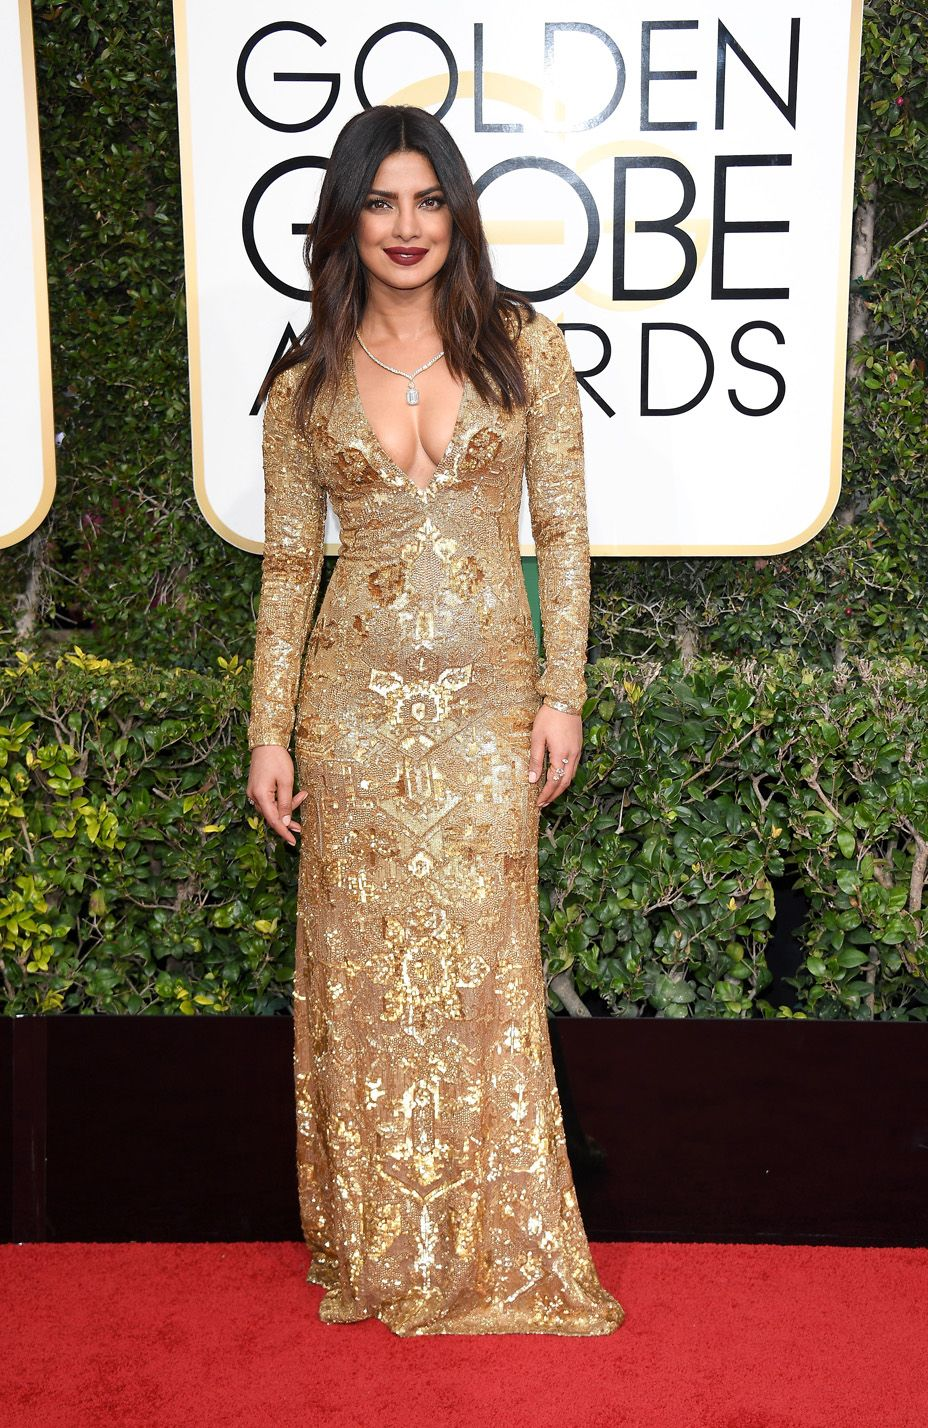 Priyanka Chopra in Ralph Lauren at the 2017 Golden Globes.